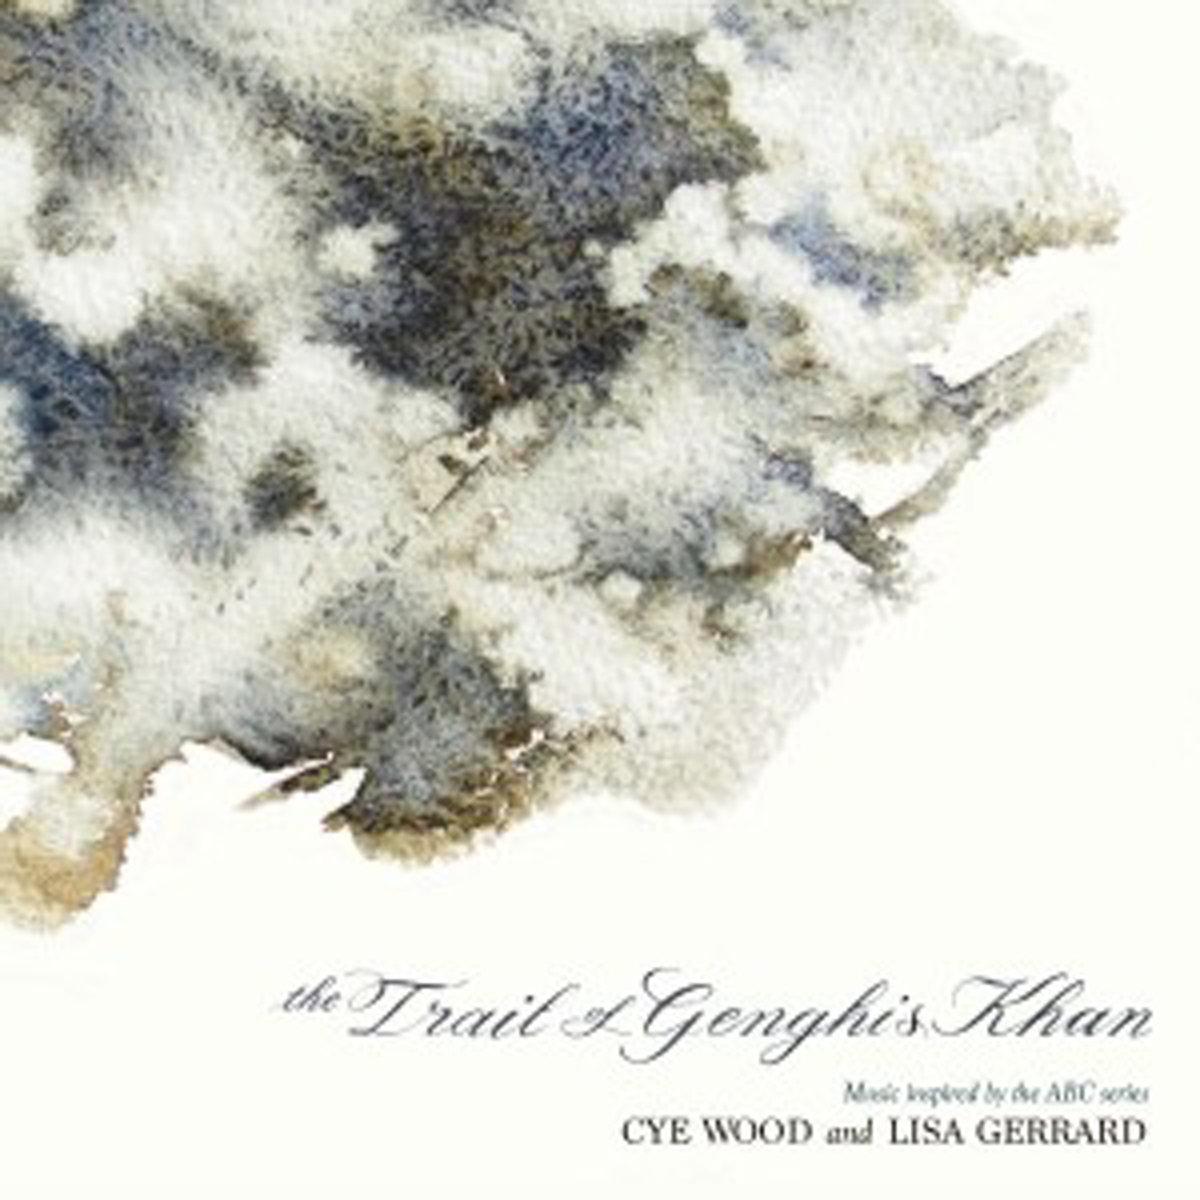 Cye Wood And Lisa Gerrard – The Trail Of Genghis Khan | INFINITE